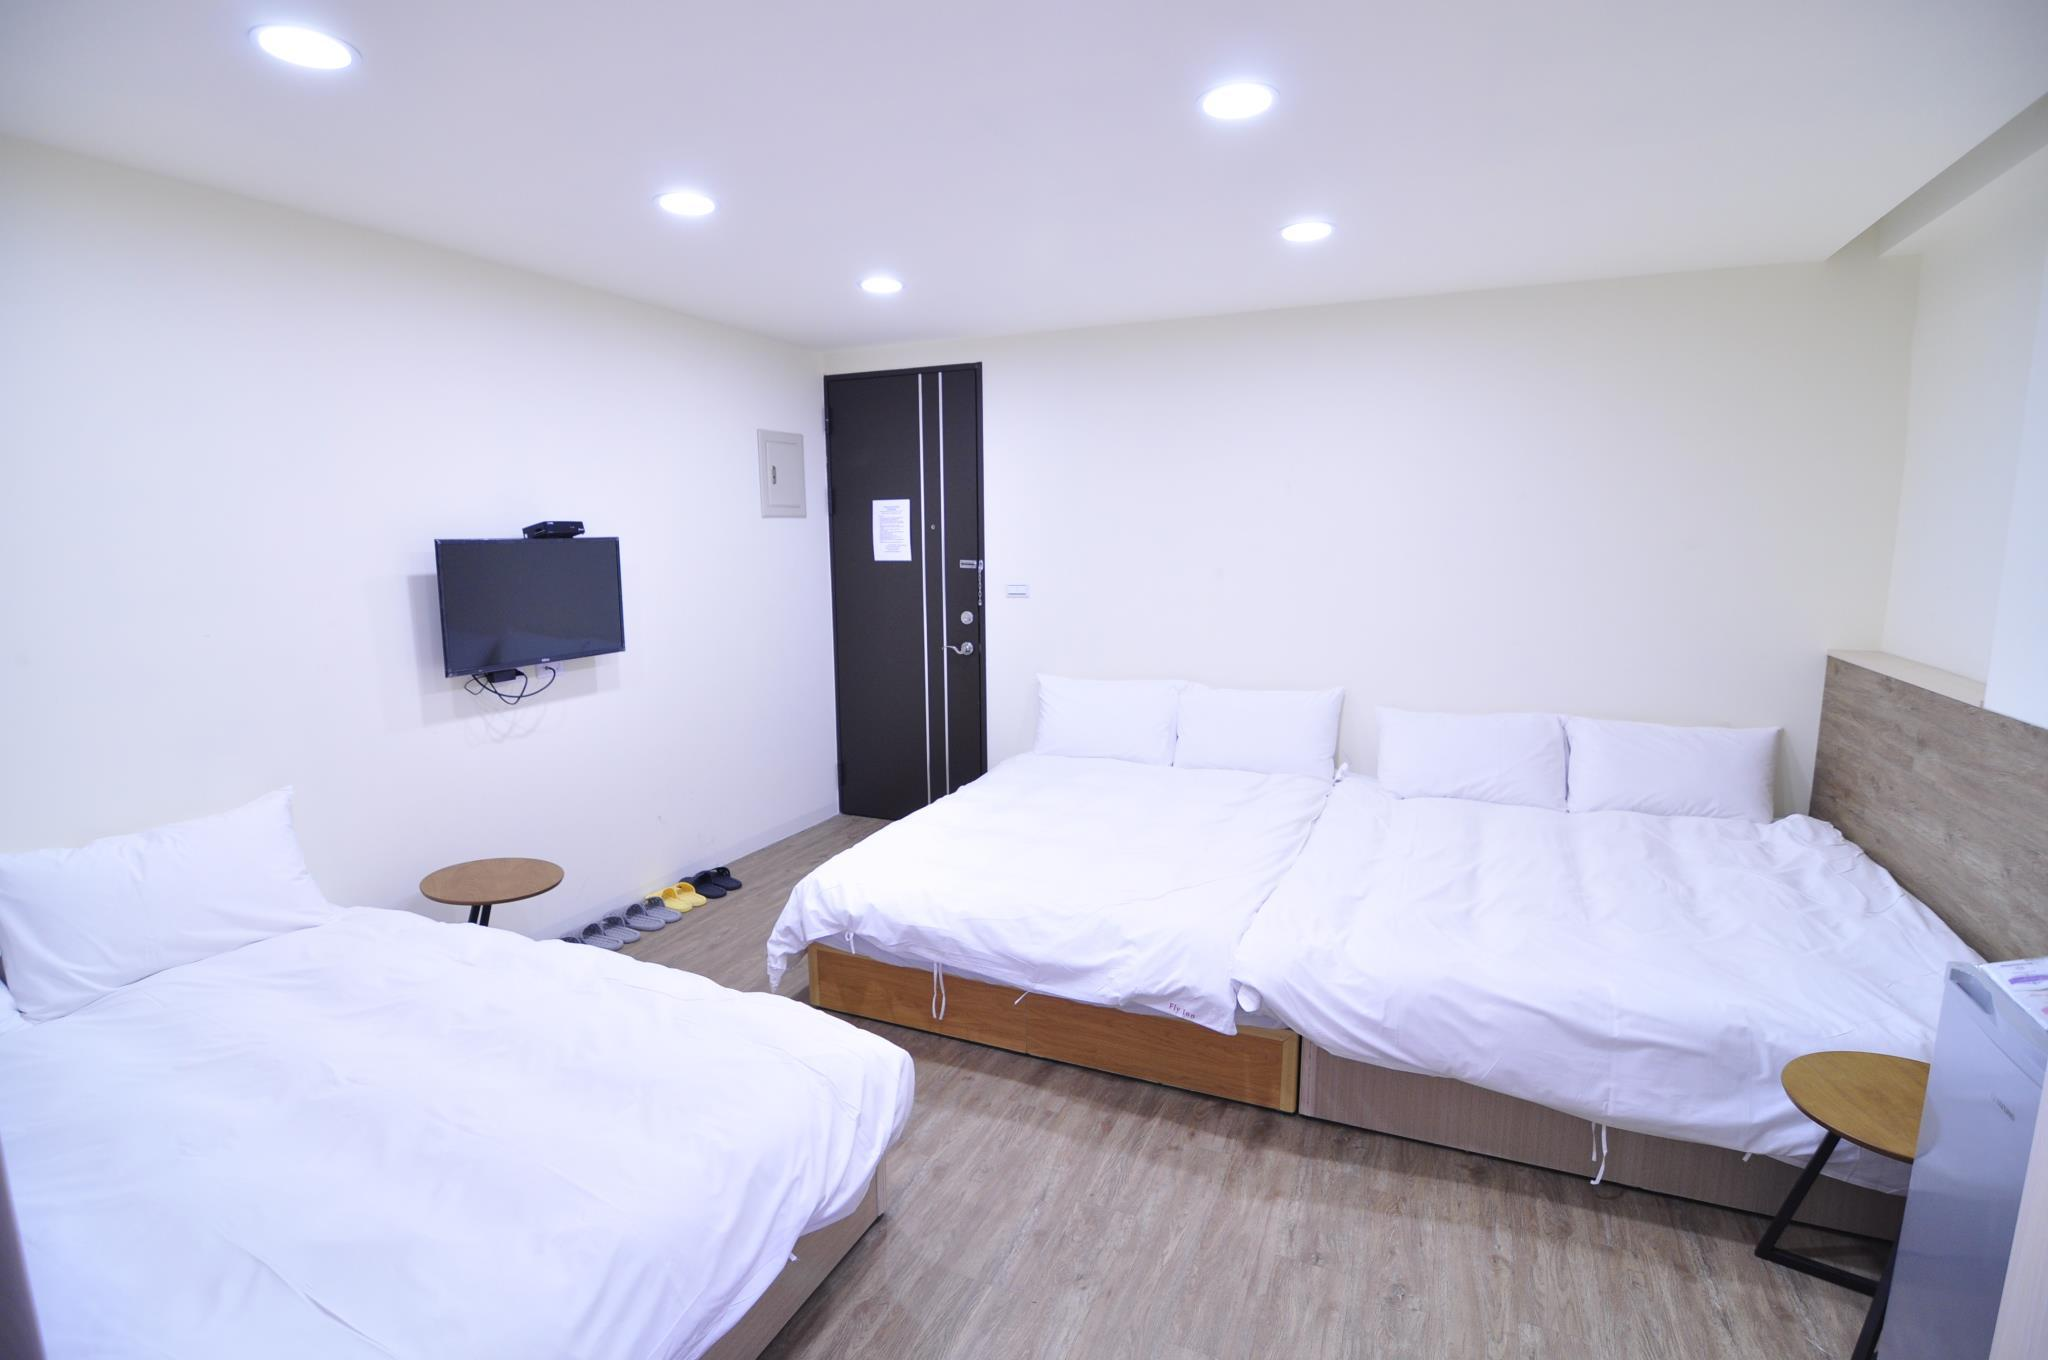 Flyinnhostel Quad Room 2